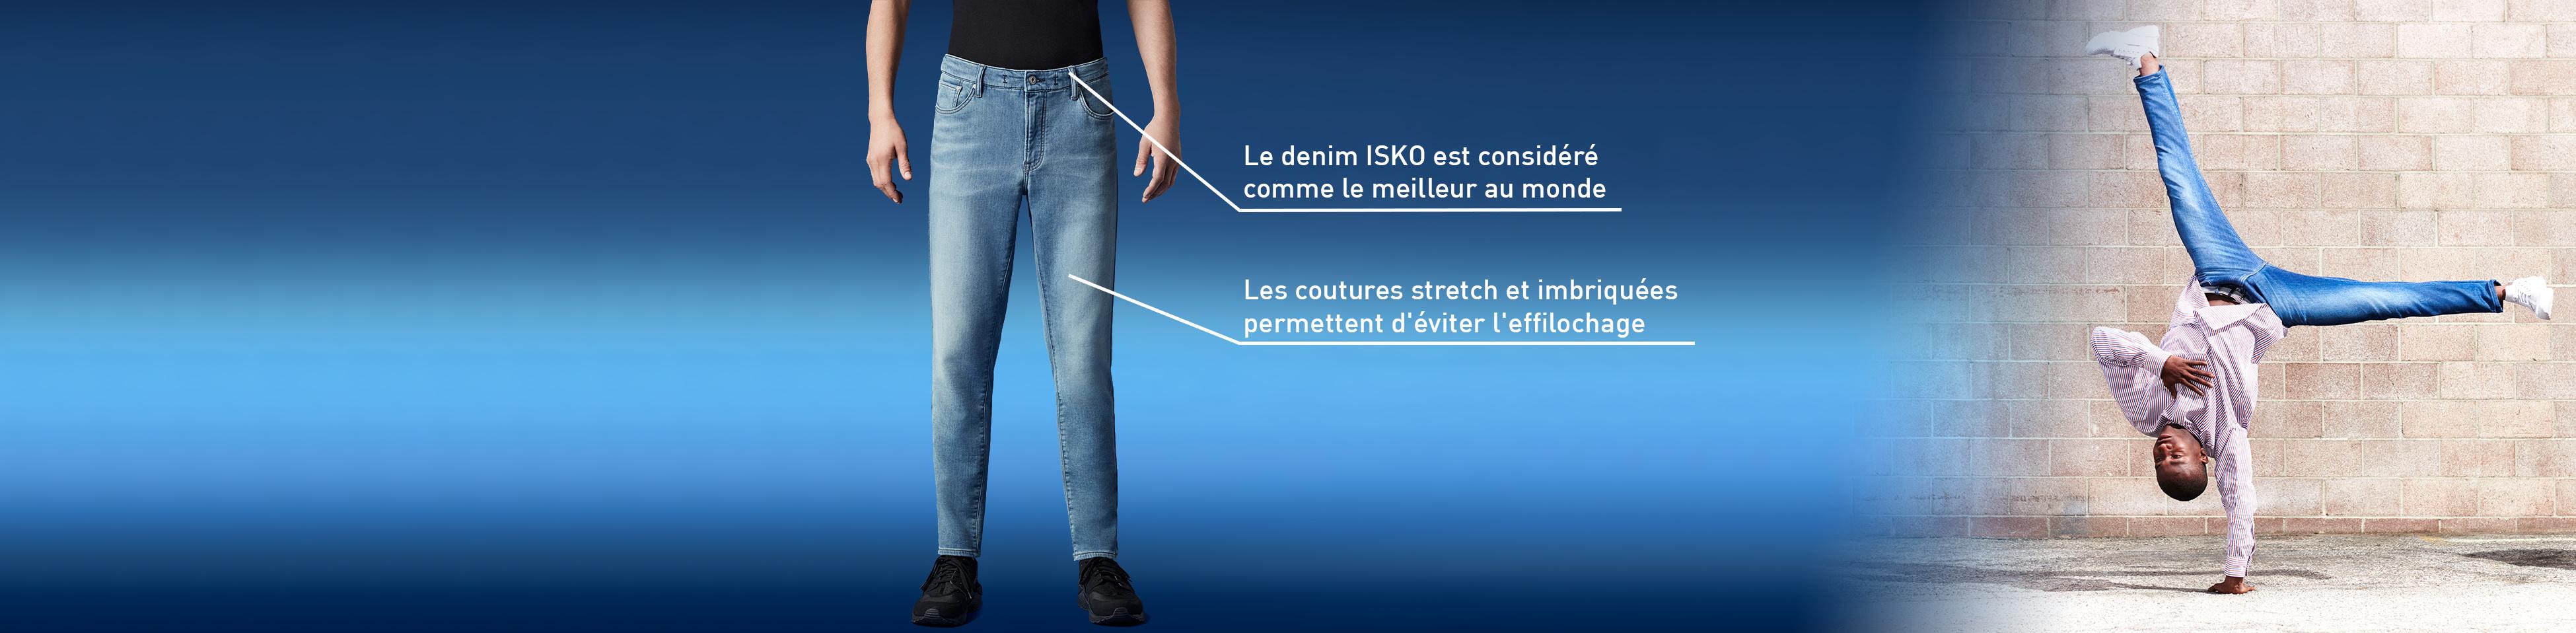 Jeans Ezy